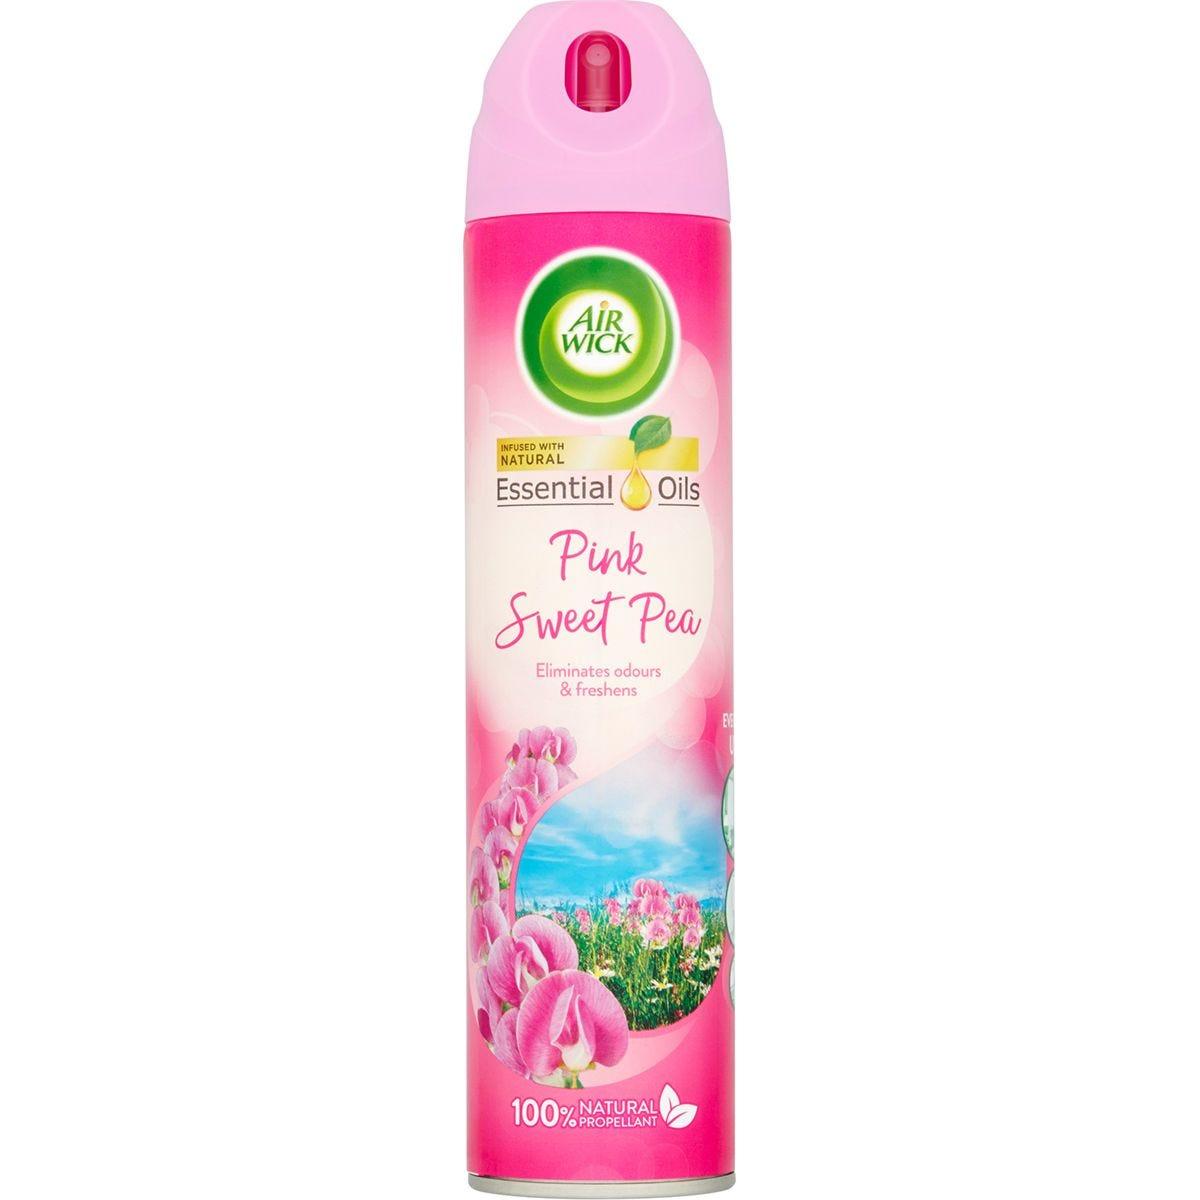 Airwick Air Freshener Pink Sweet Pea Aerosol - 240ml